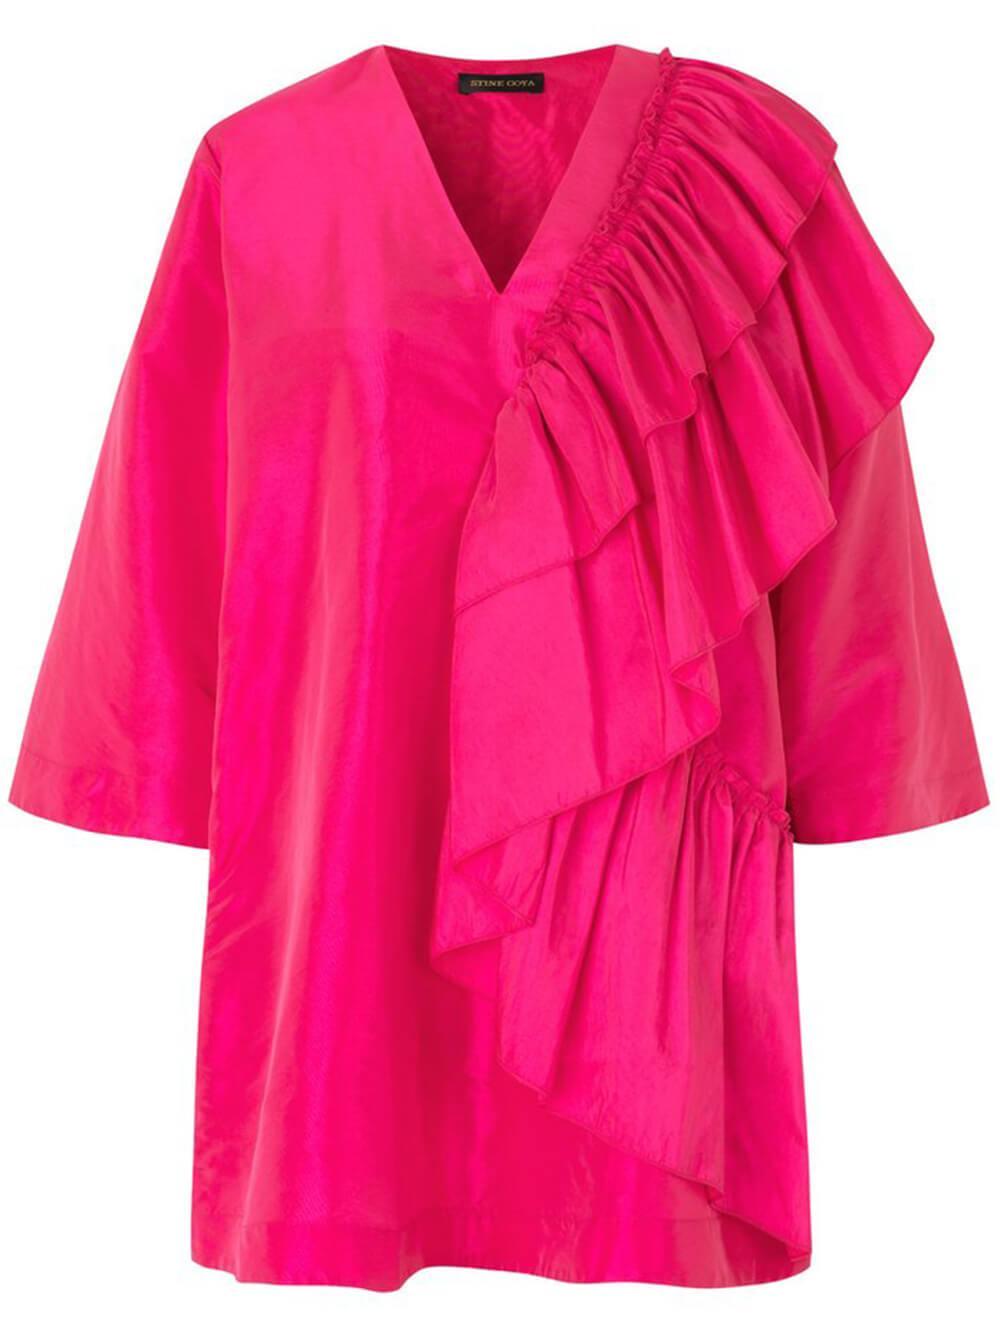 Marina Dress Item # SG3706